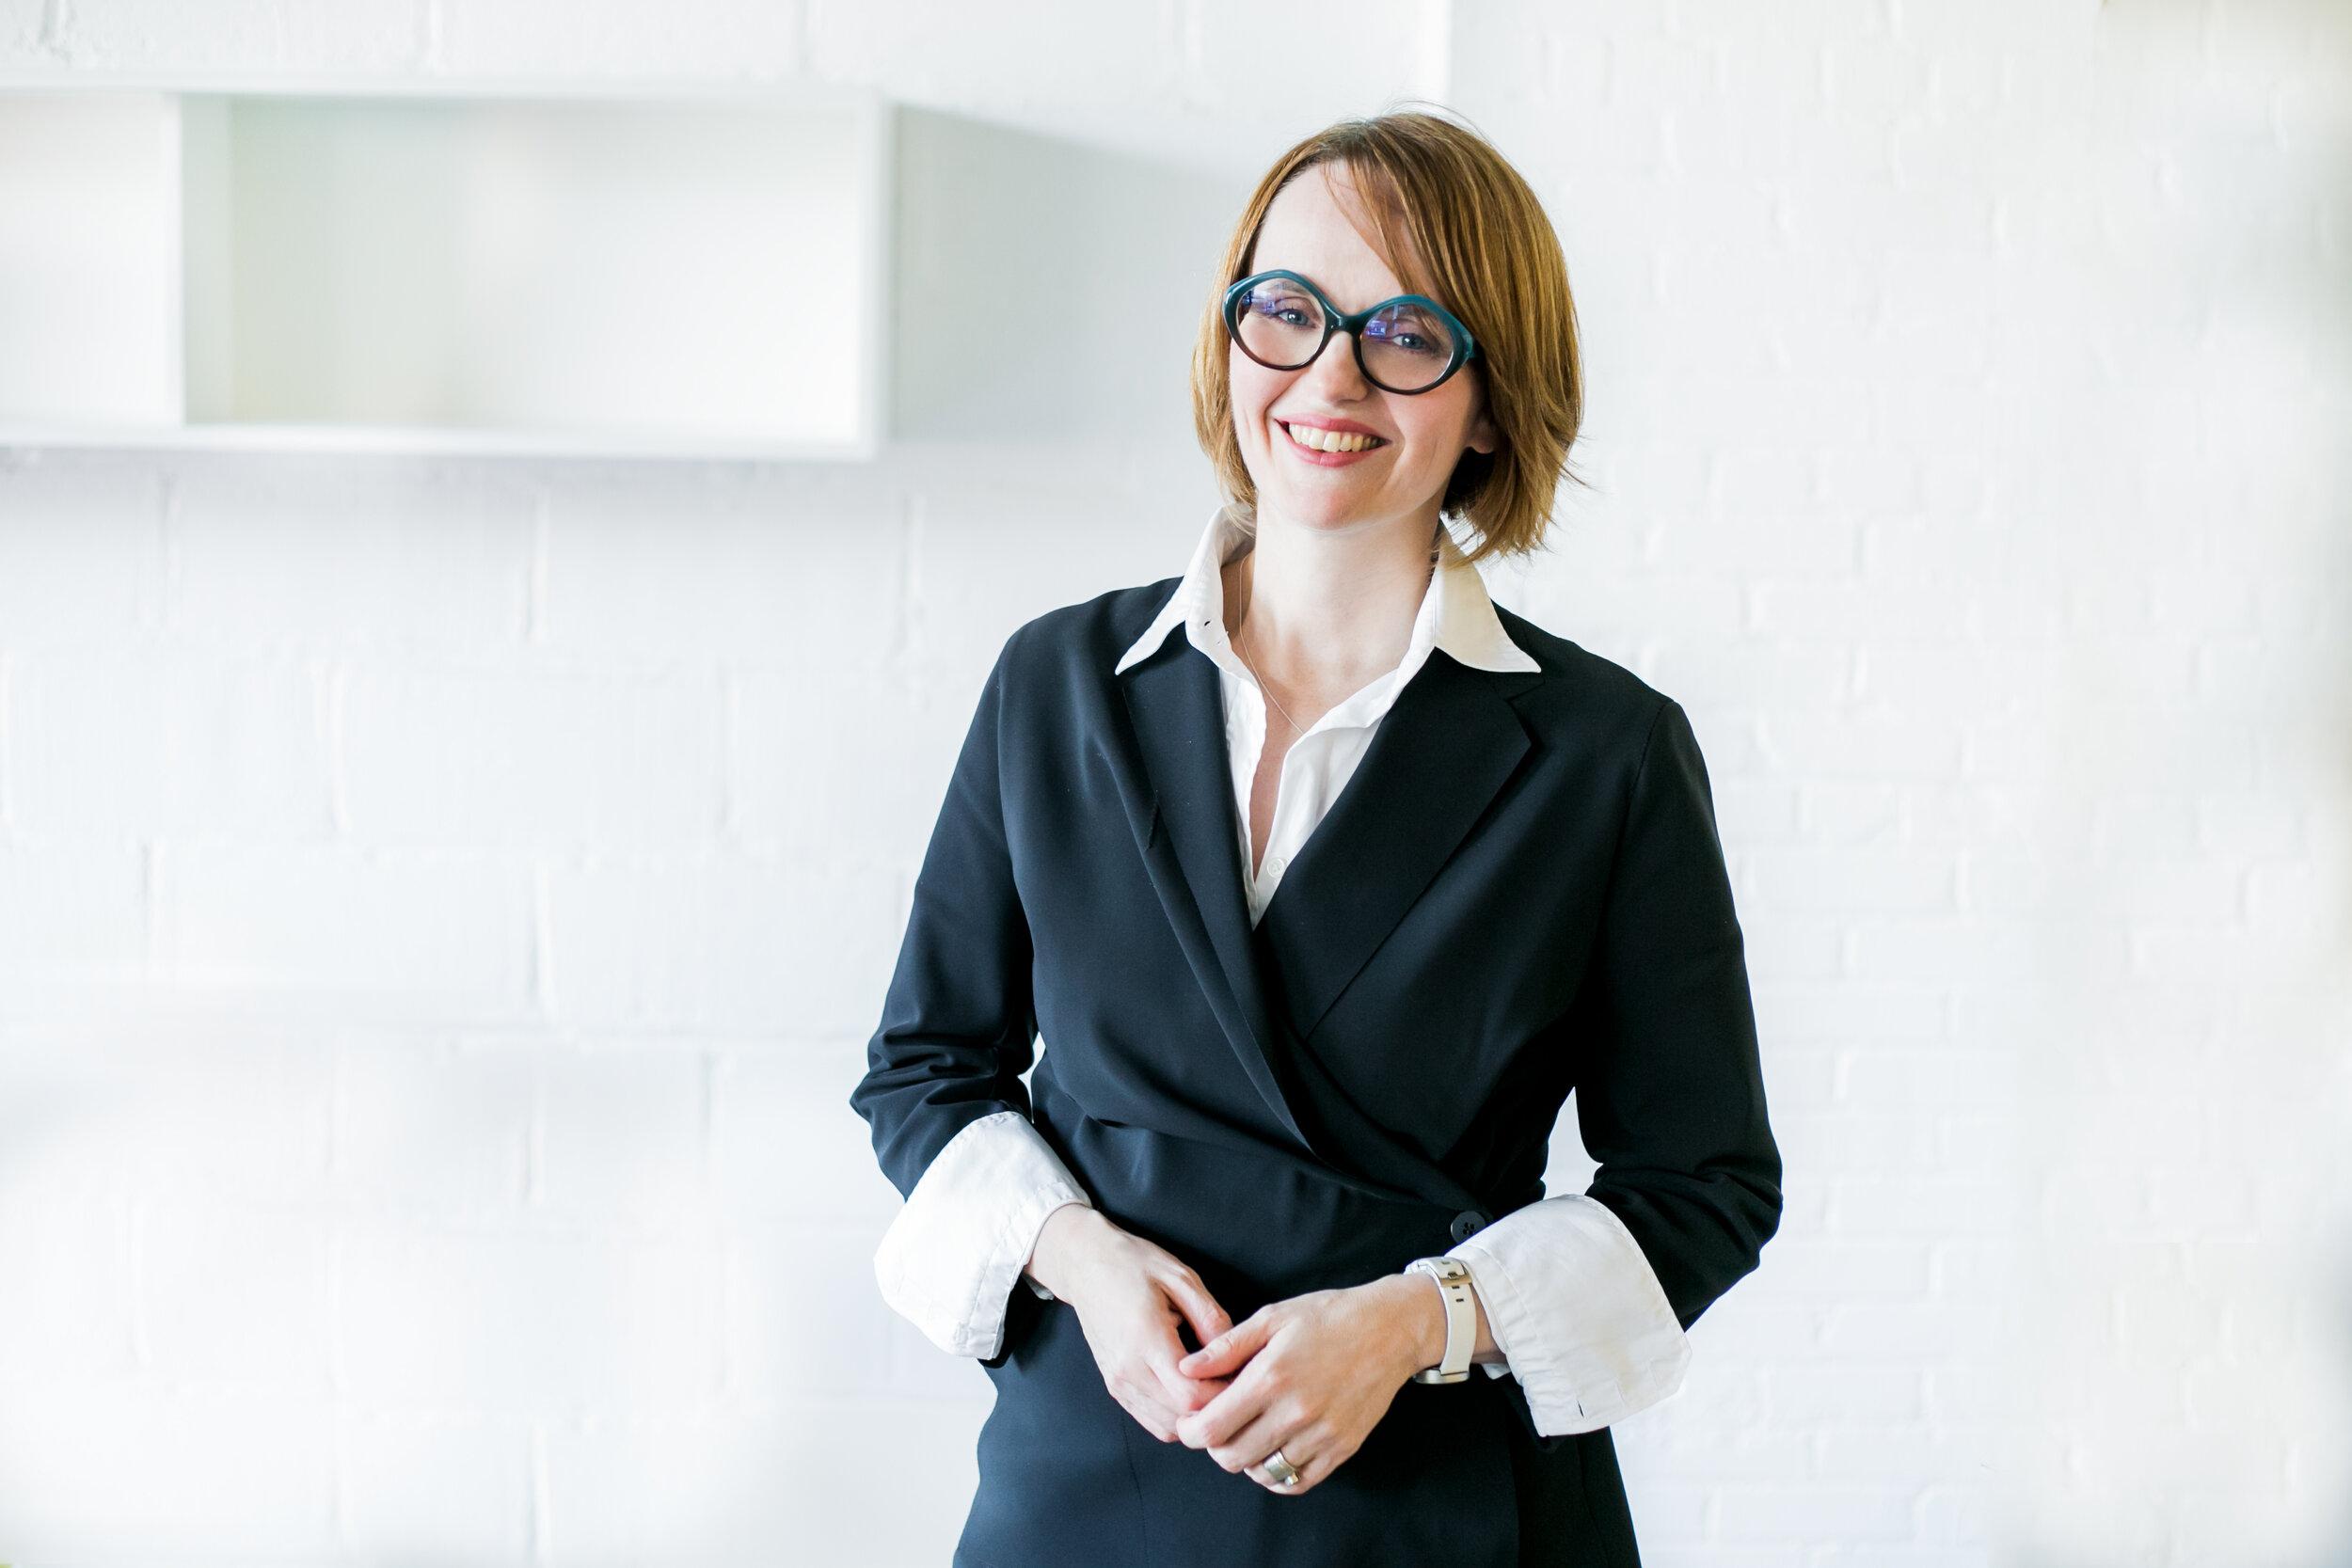 Meg Graham - BES, B.Arch (Waterloo), MDesS (Harvard University), OAA, FRAIC